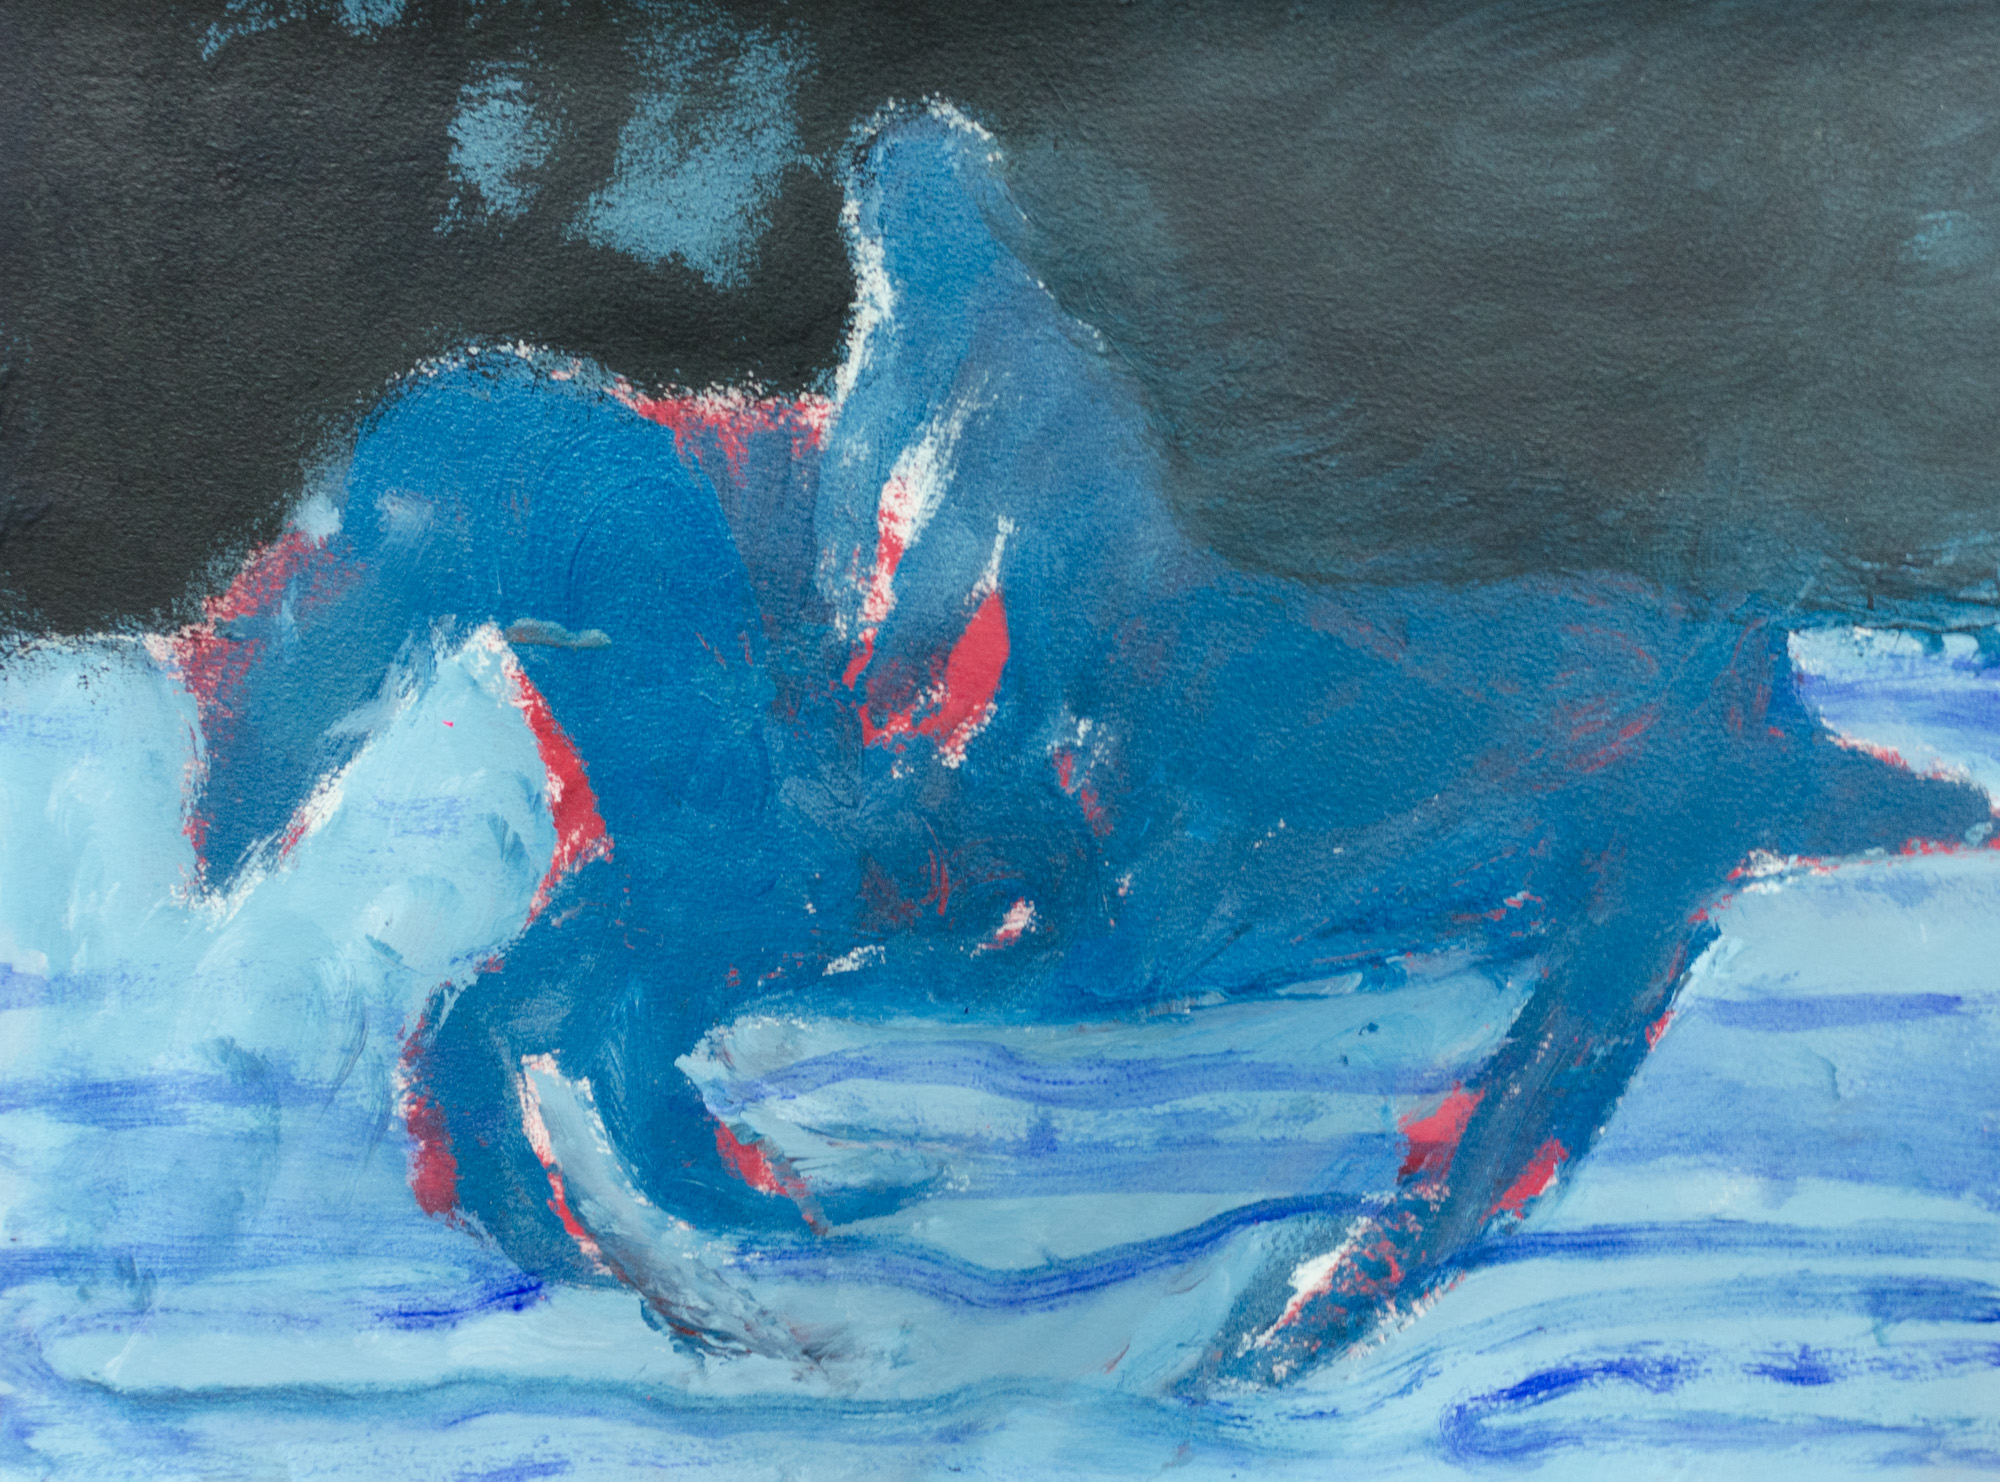 Rhys Lee, Riders, 2016, Acrylic on paper, 28 x 38cm, $700-10.jpg